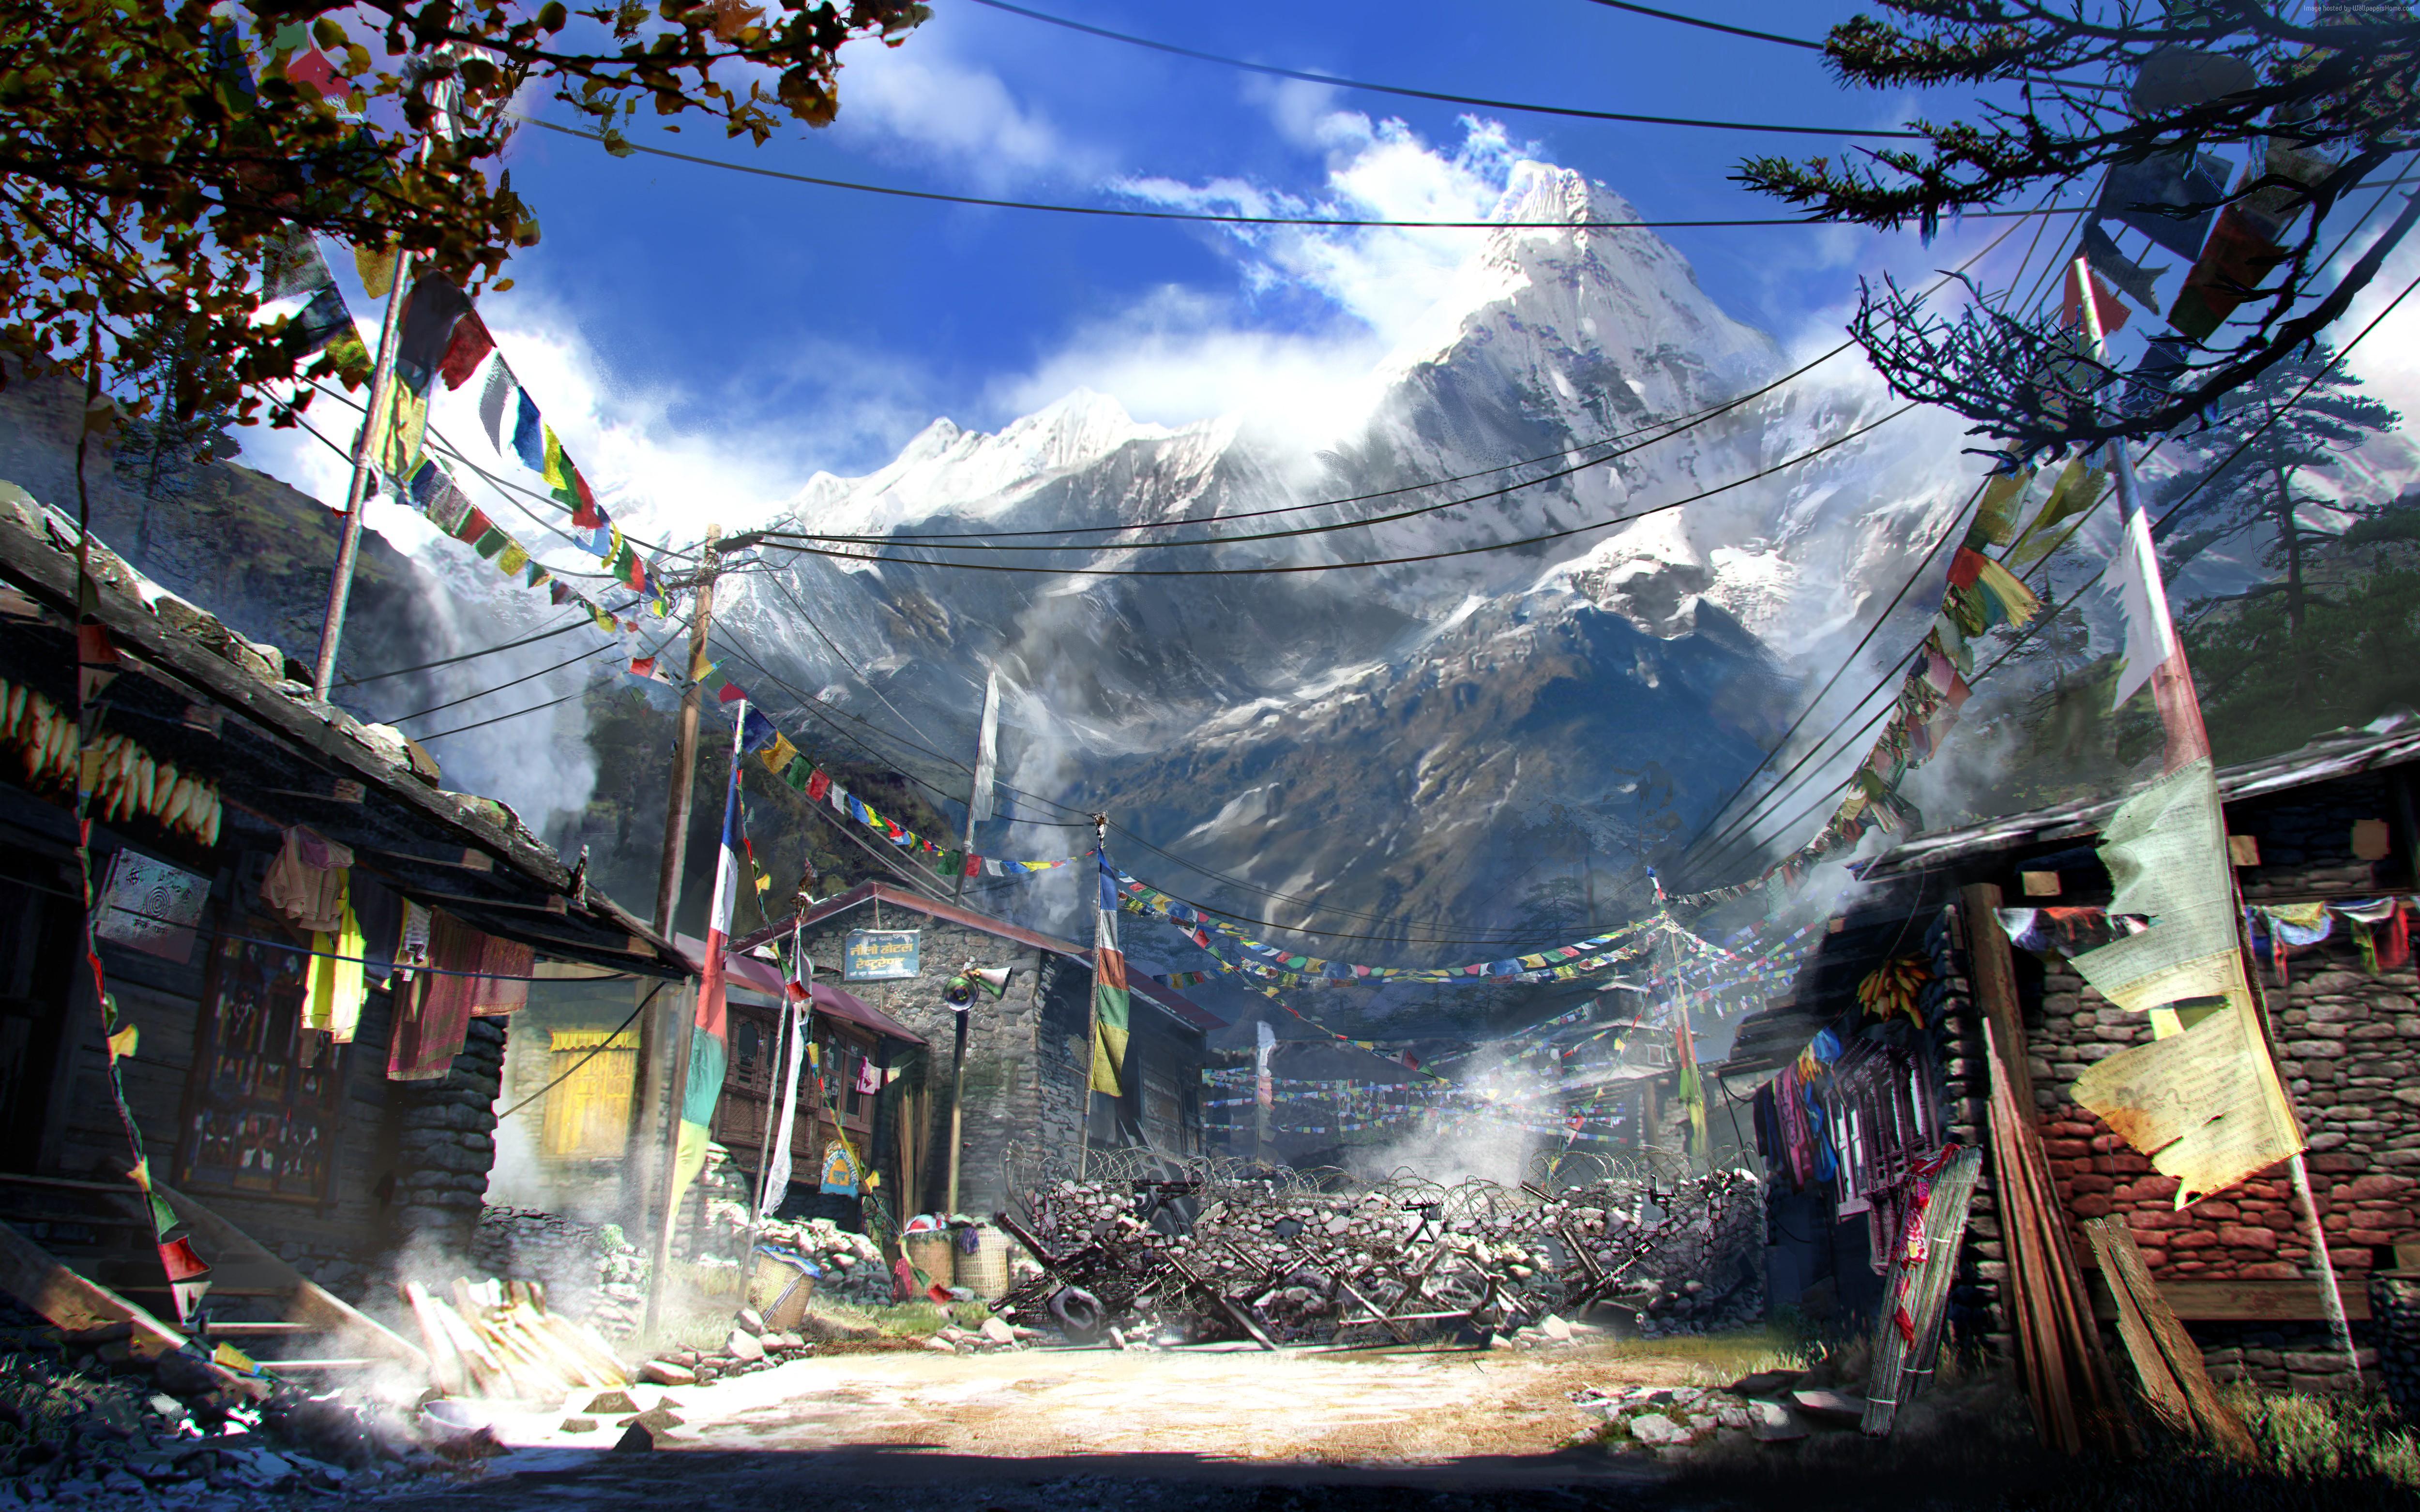 wallpaper far cry 4, game, open world, adventure games, shooter